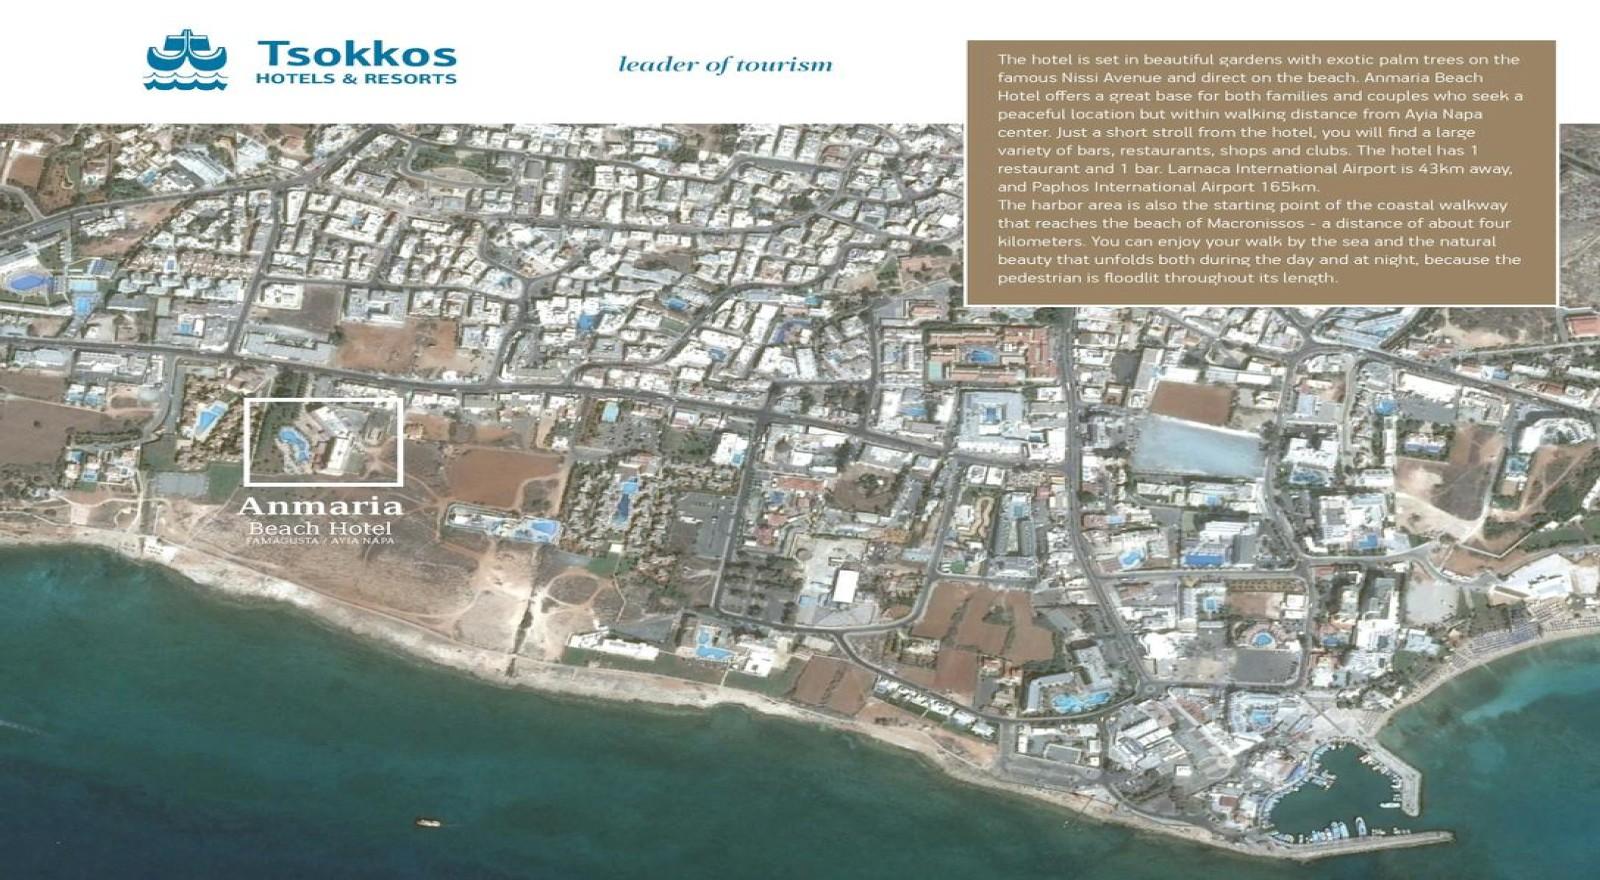 Anmaria Beach Hotel Ayia Napa Cyprus - Map of napa hotels